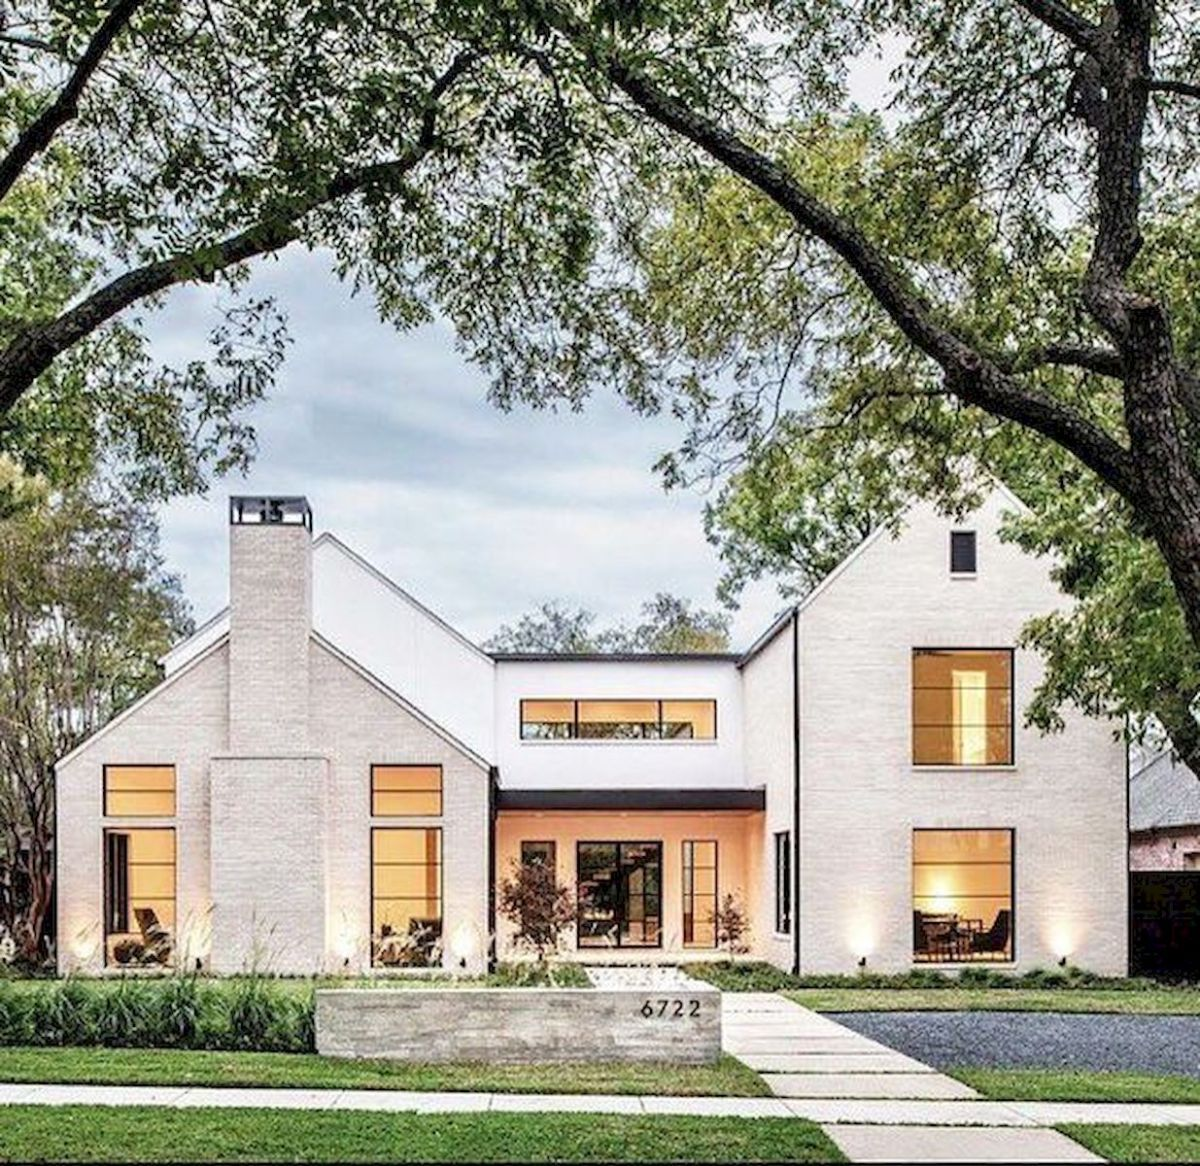 33 beautiful modern farmhouse exterior design ideas 1